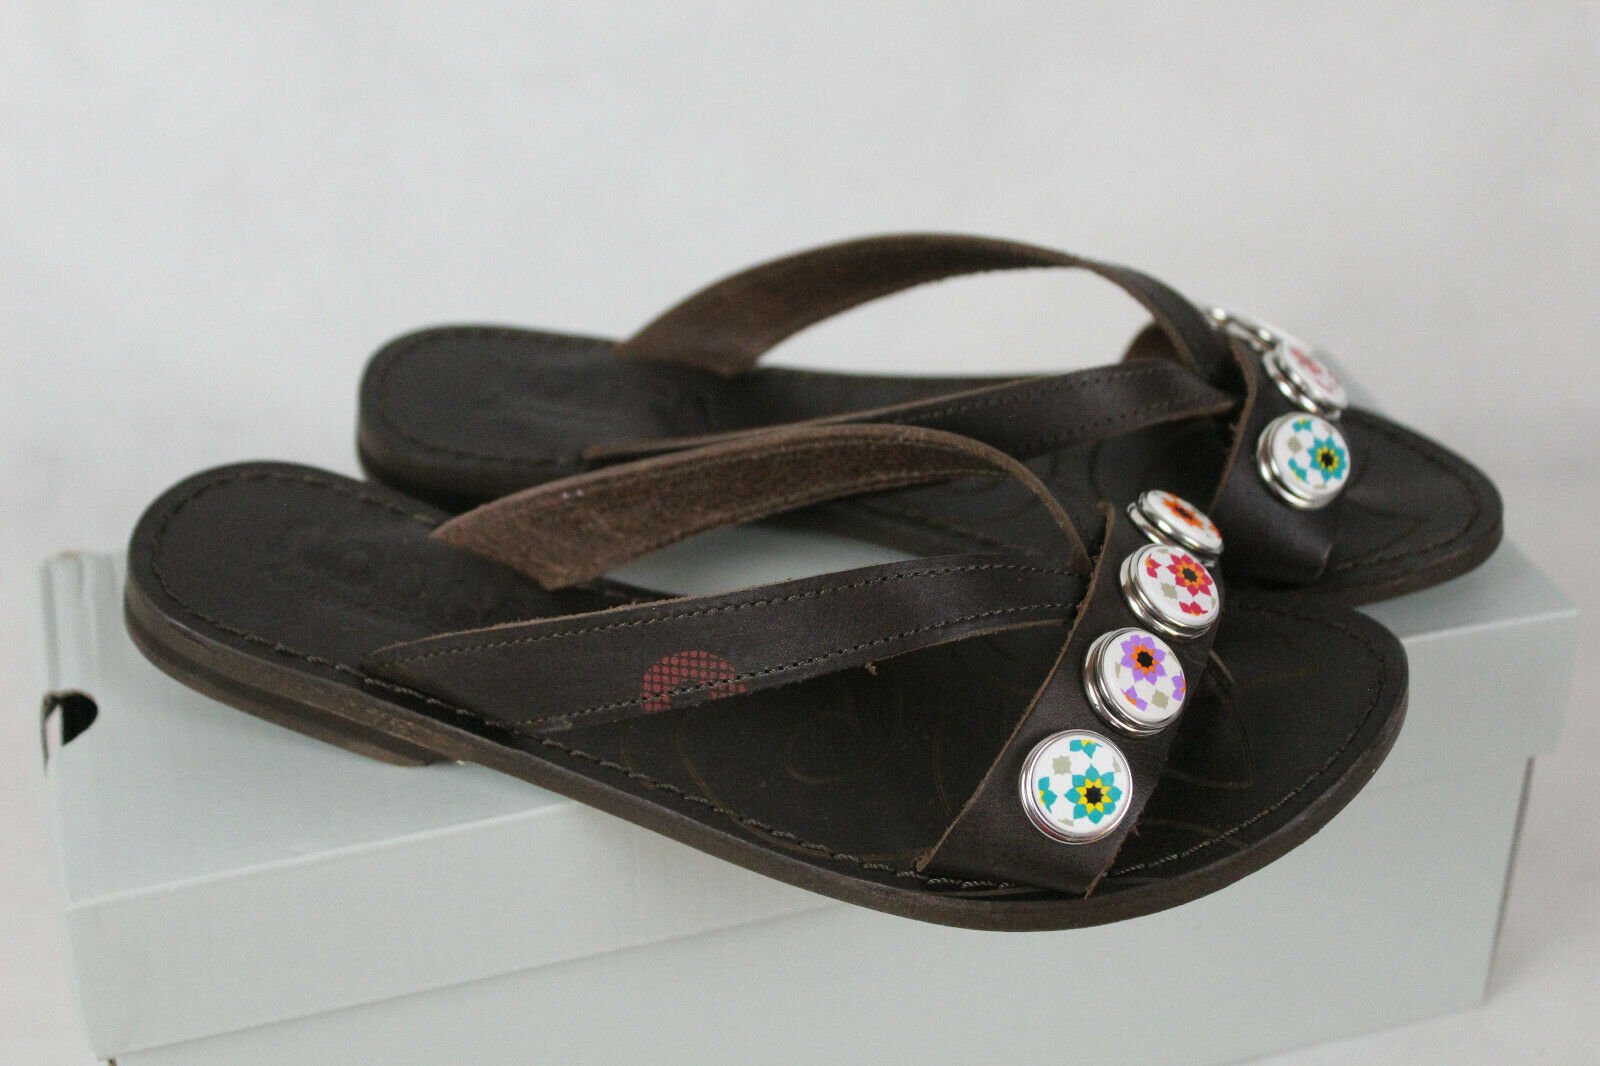 Noosa Description Classic Sandals Toe Separator Womens Size 36 NEW, LP